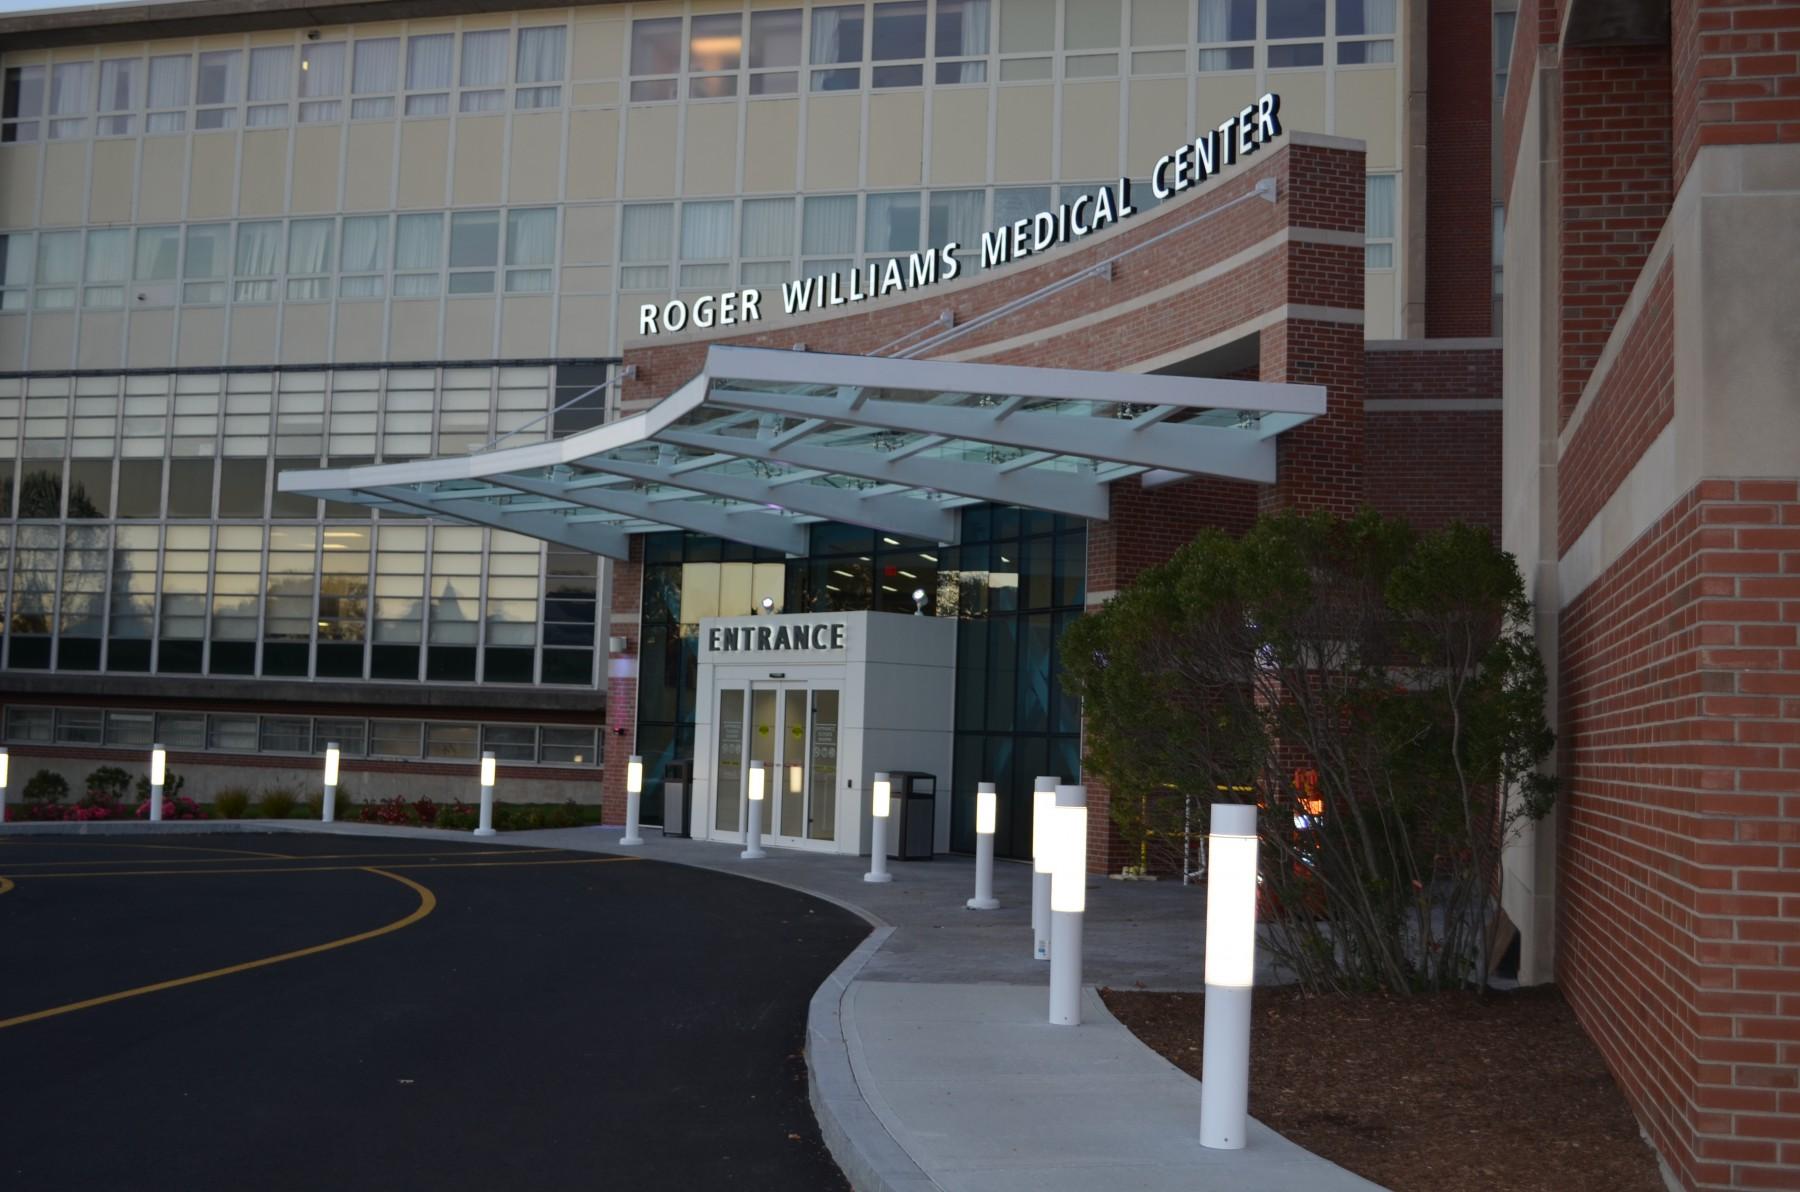 Roger Williams Medical Center - Emergency Department image 0